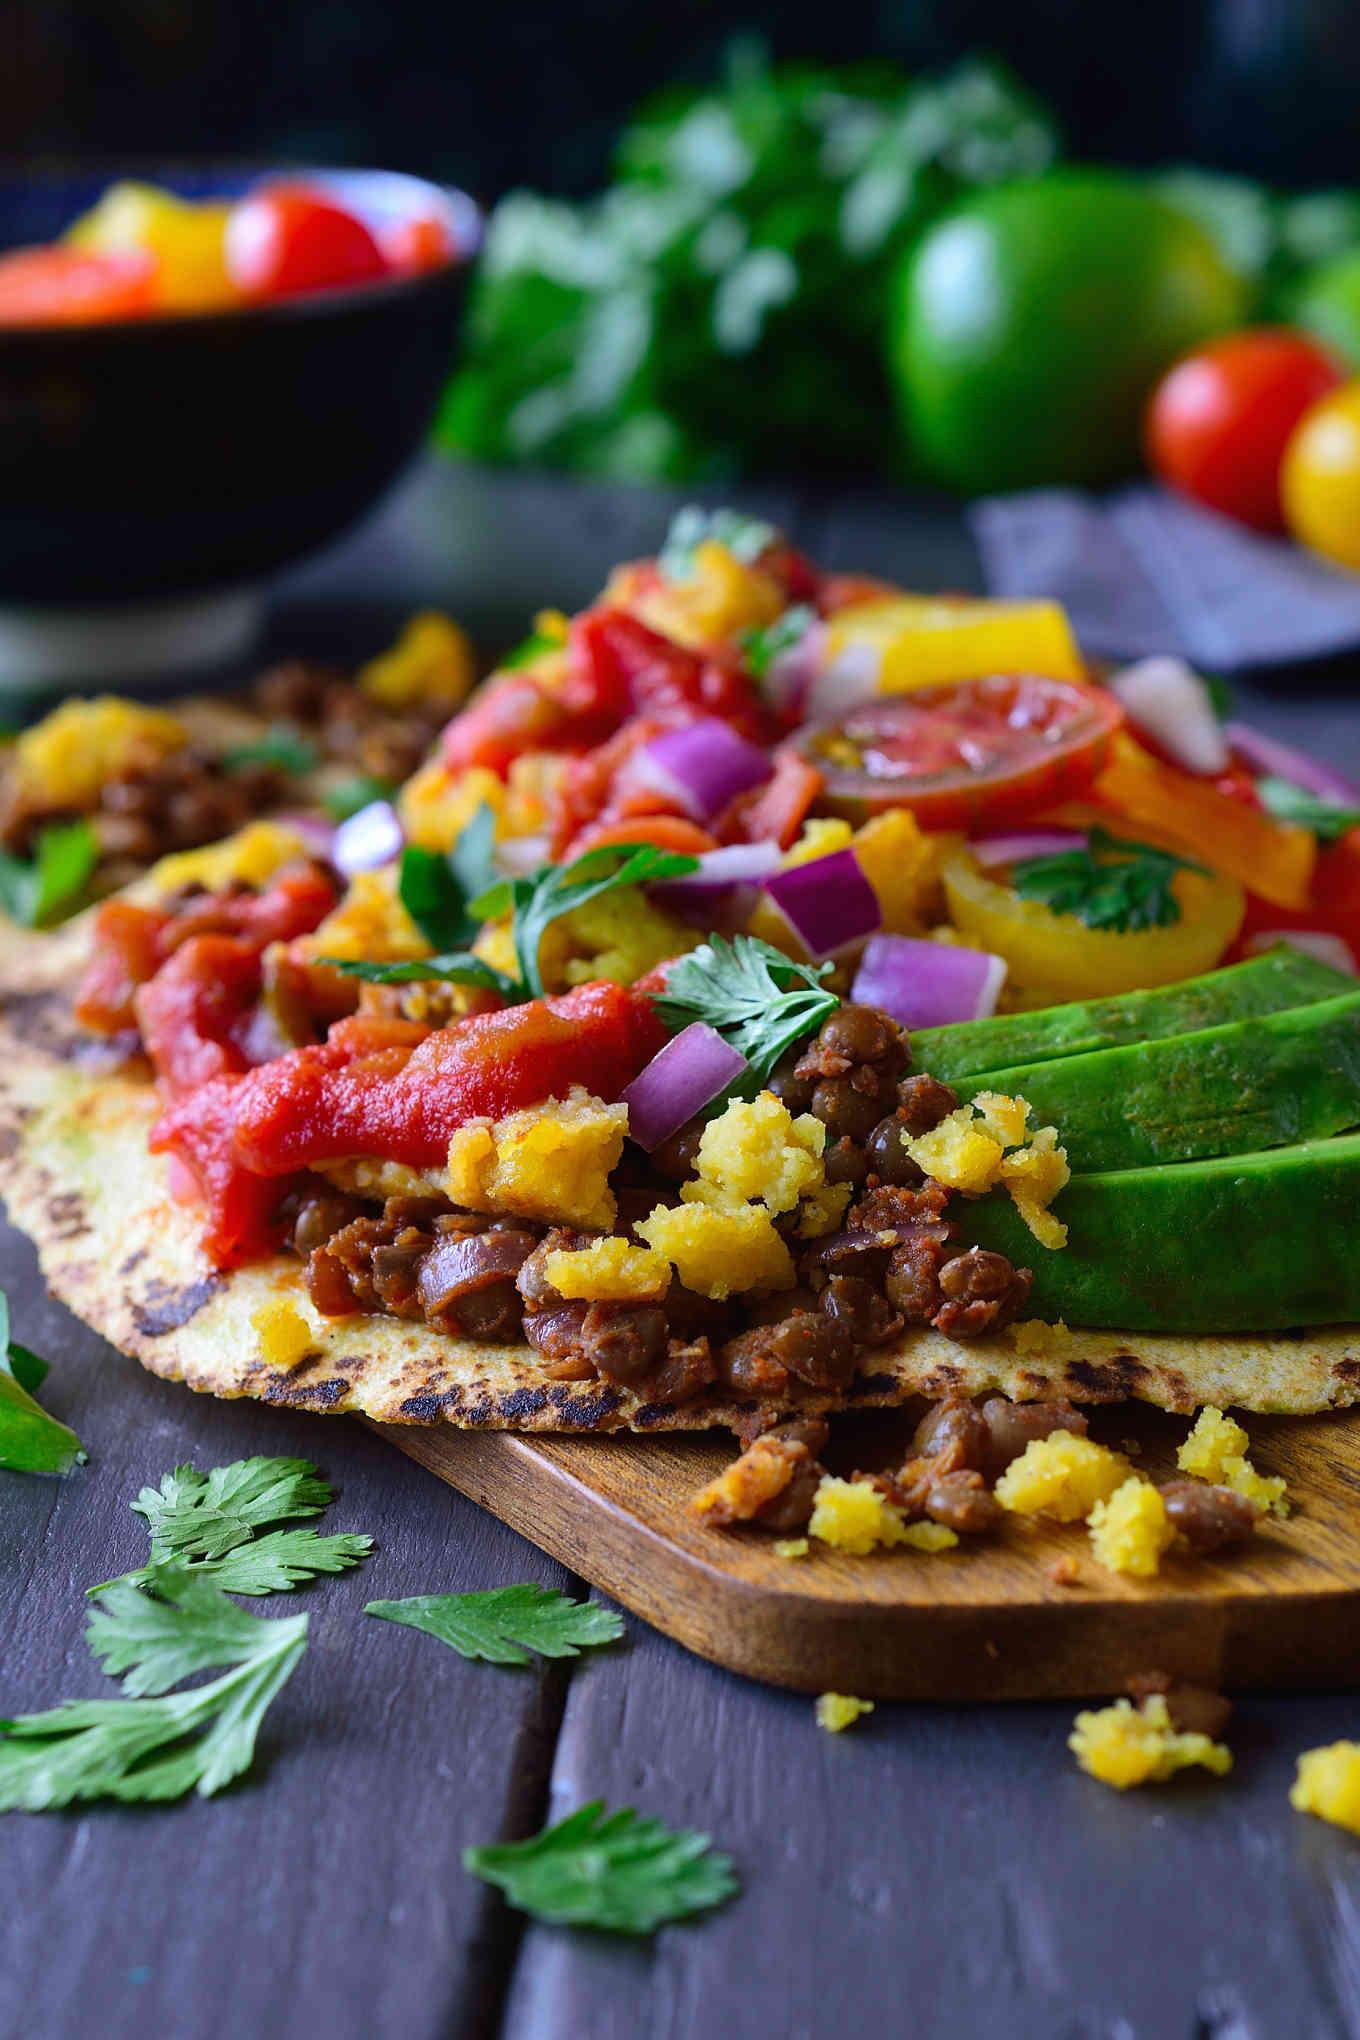 Vegan Breakfast  11 High Protein Breakfast Ideas GreenBlender